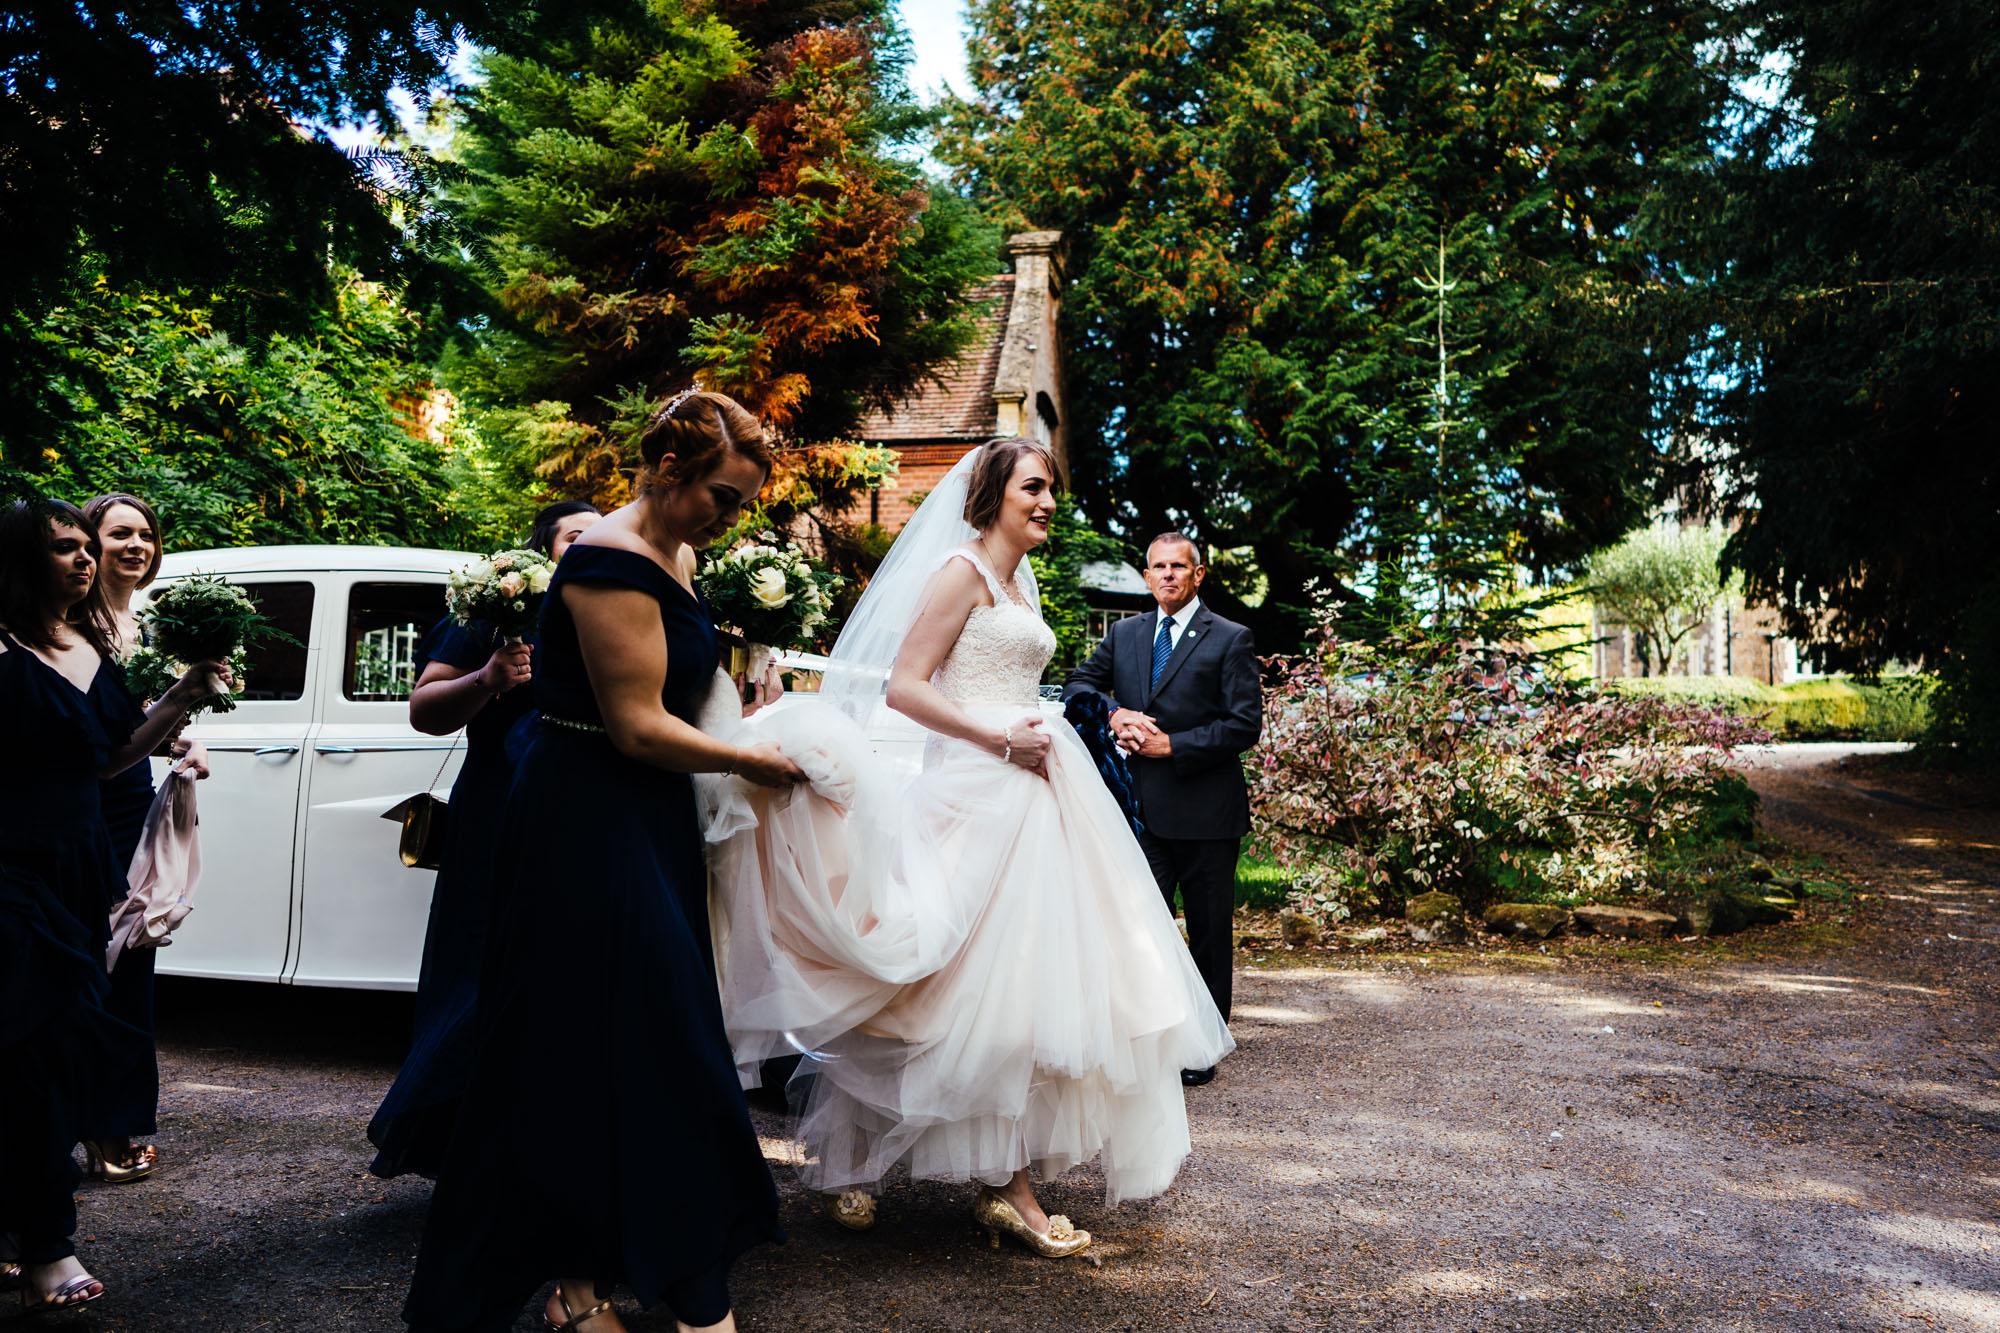 wedding-at-dodford-manor-19